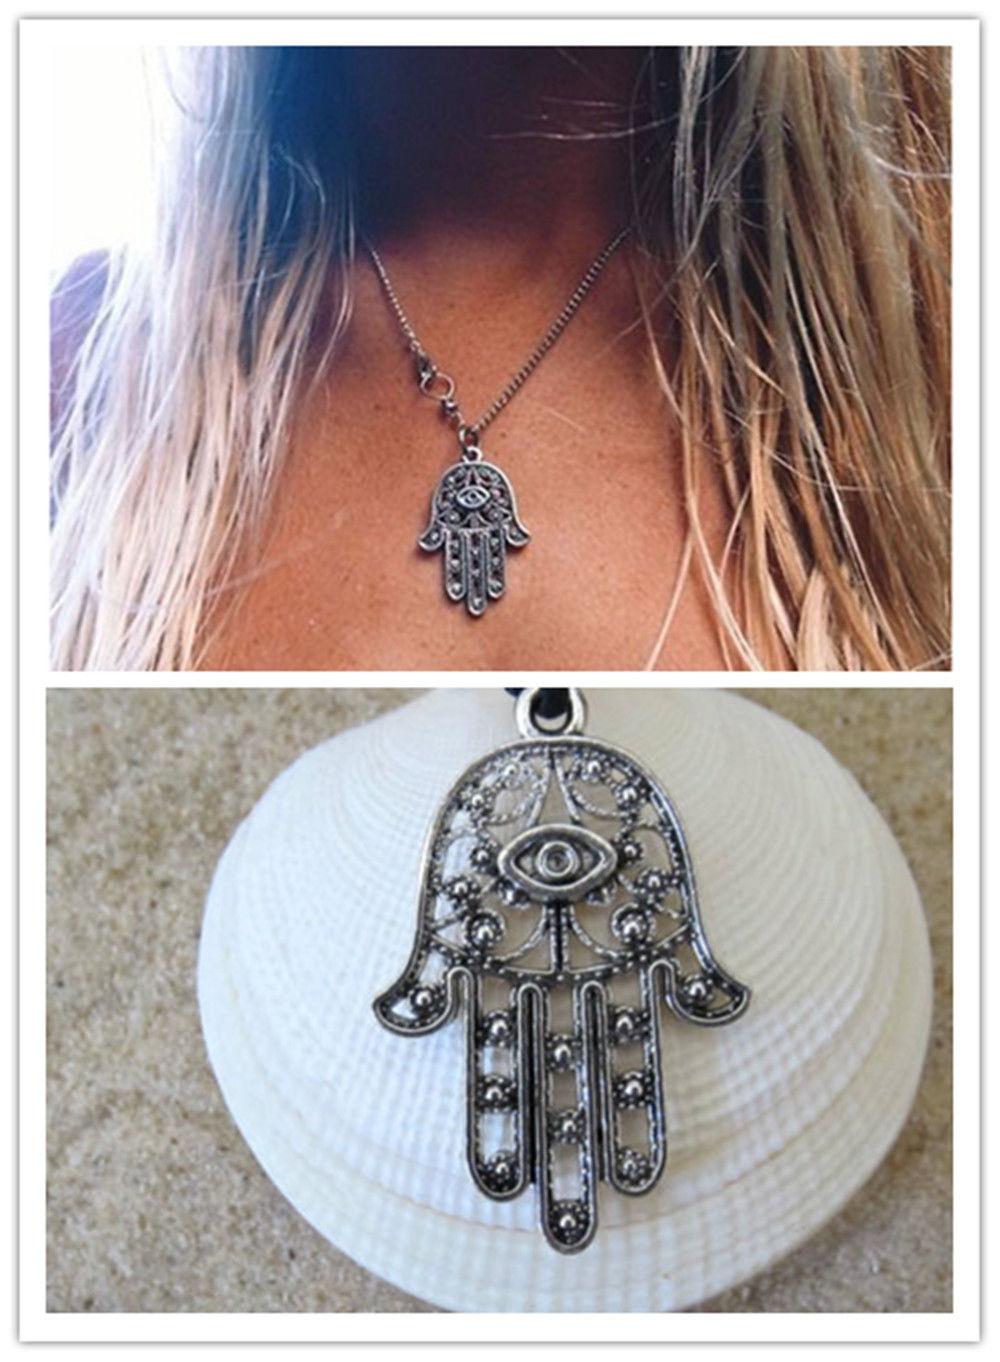 Hamsa Fatima Hand Pendant Charm Silver Chain Necklace Jewish Judaica Kabbalah(China (Mainland))